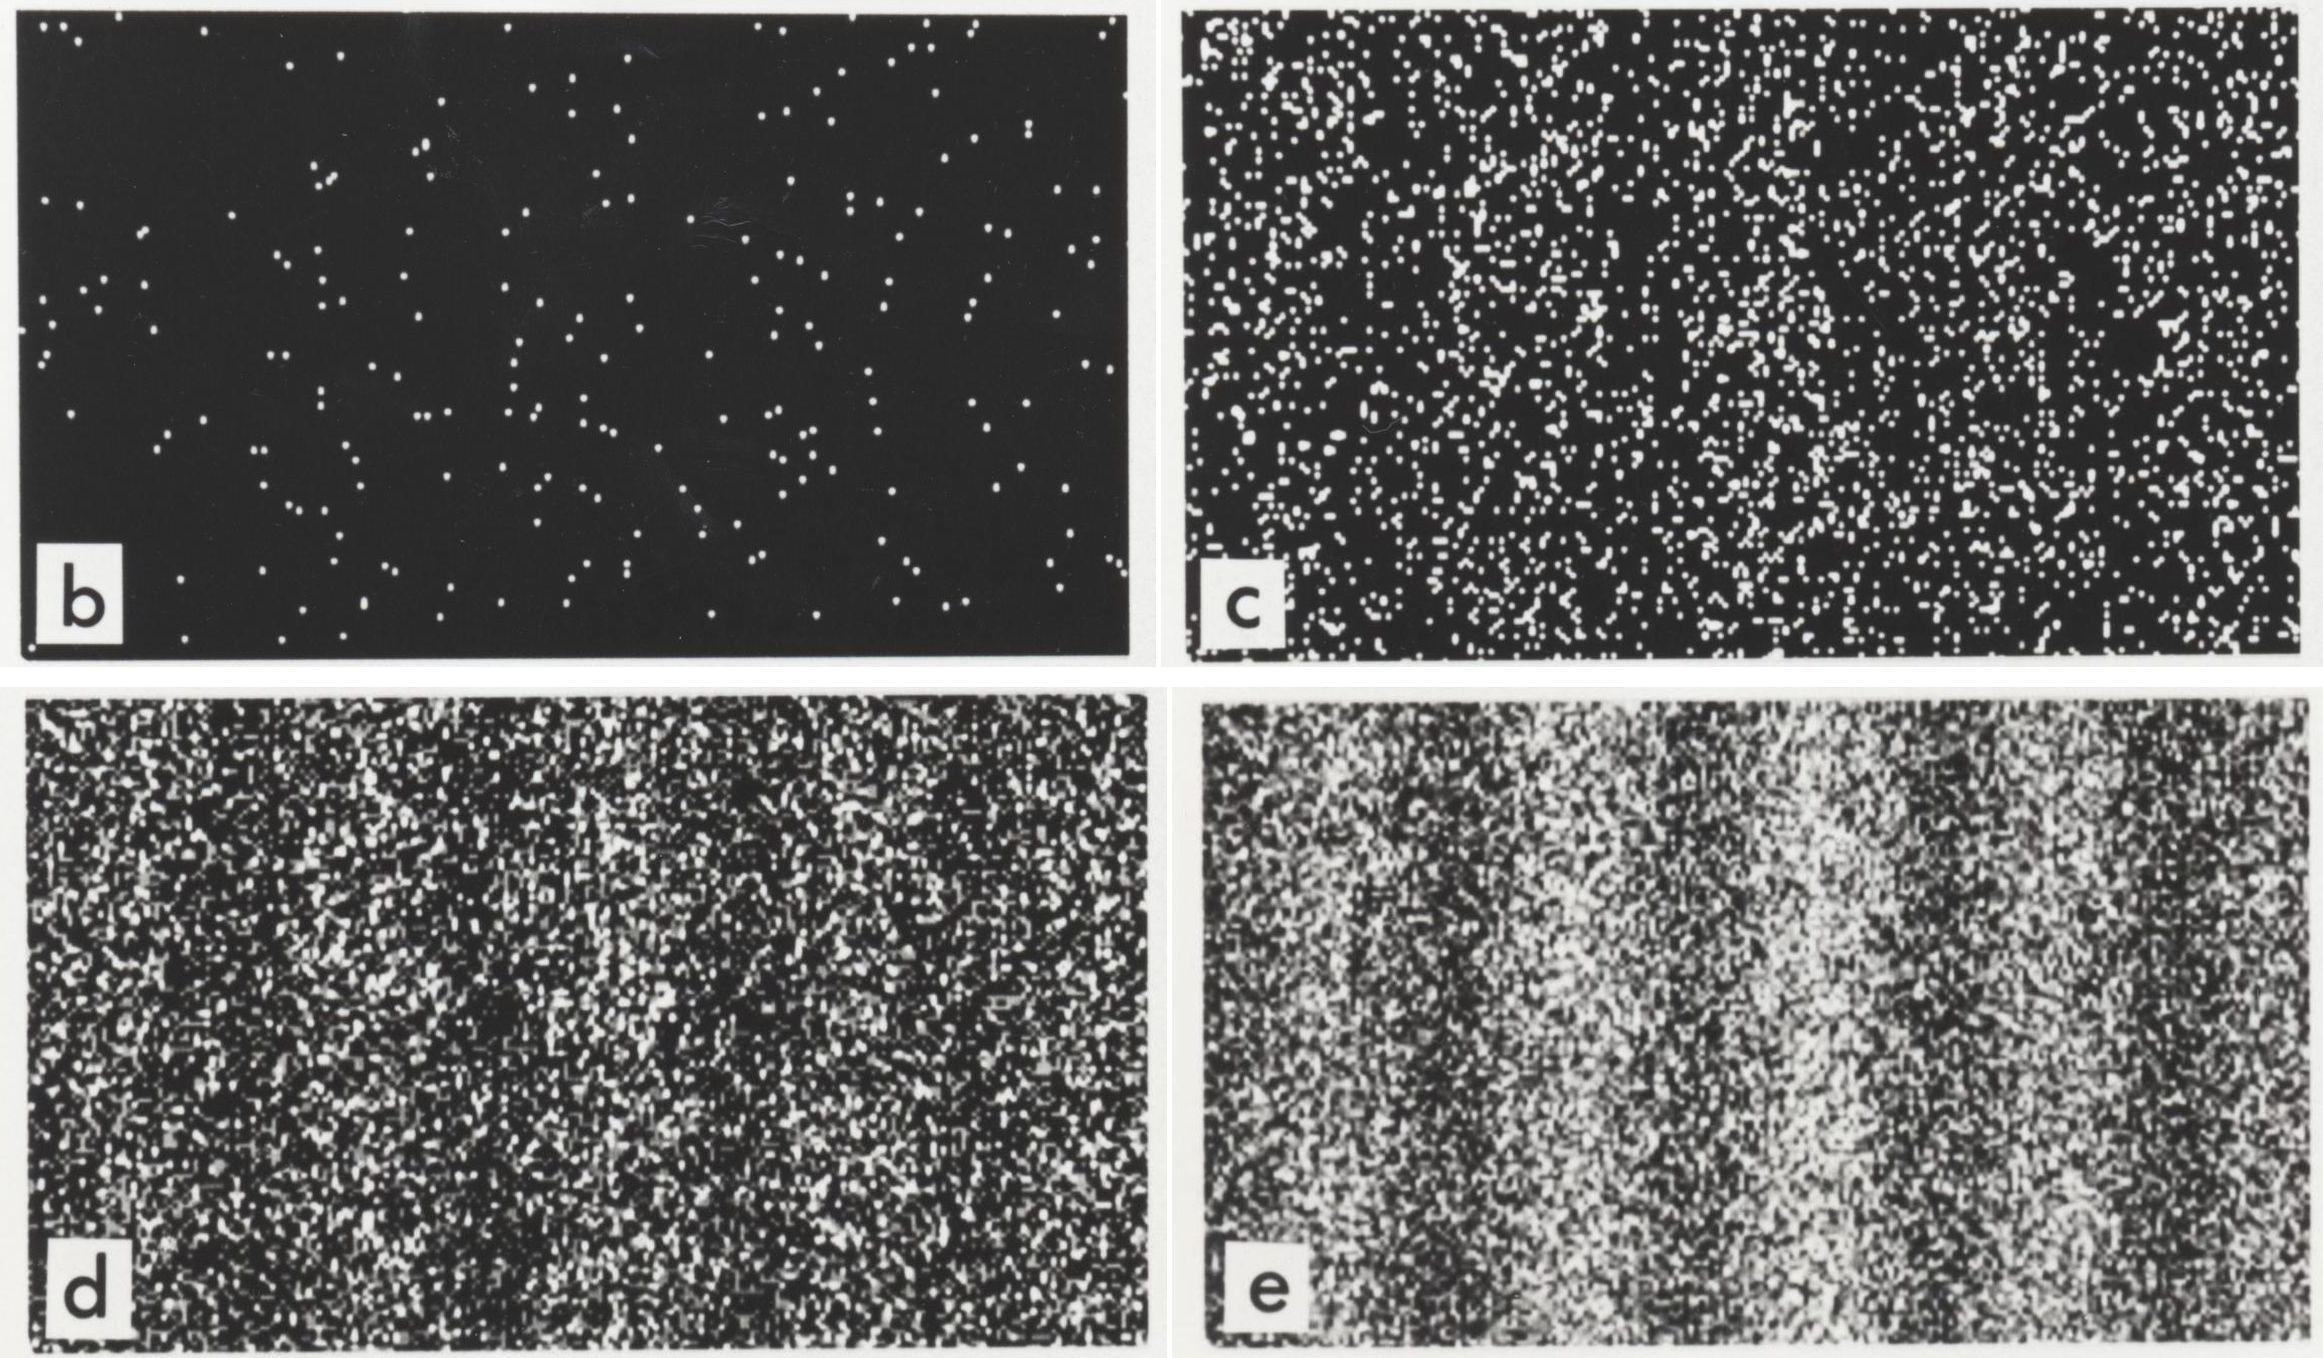 Double-slit experiment results Tanamura four - Wikimedia Commons - Le Cosmogone et la Diane (blogspot.fr)